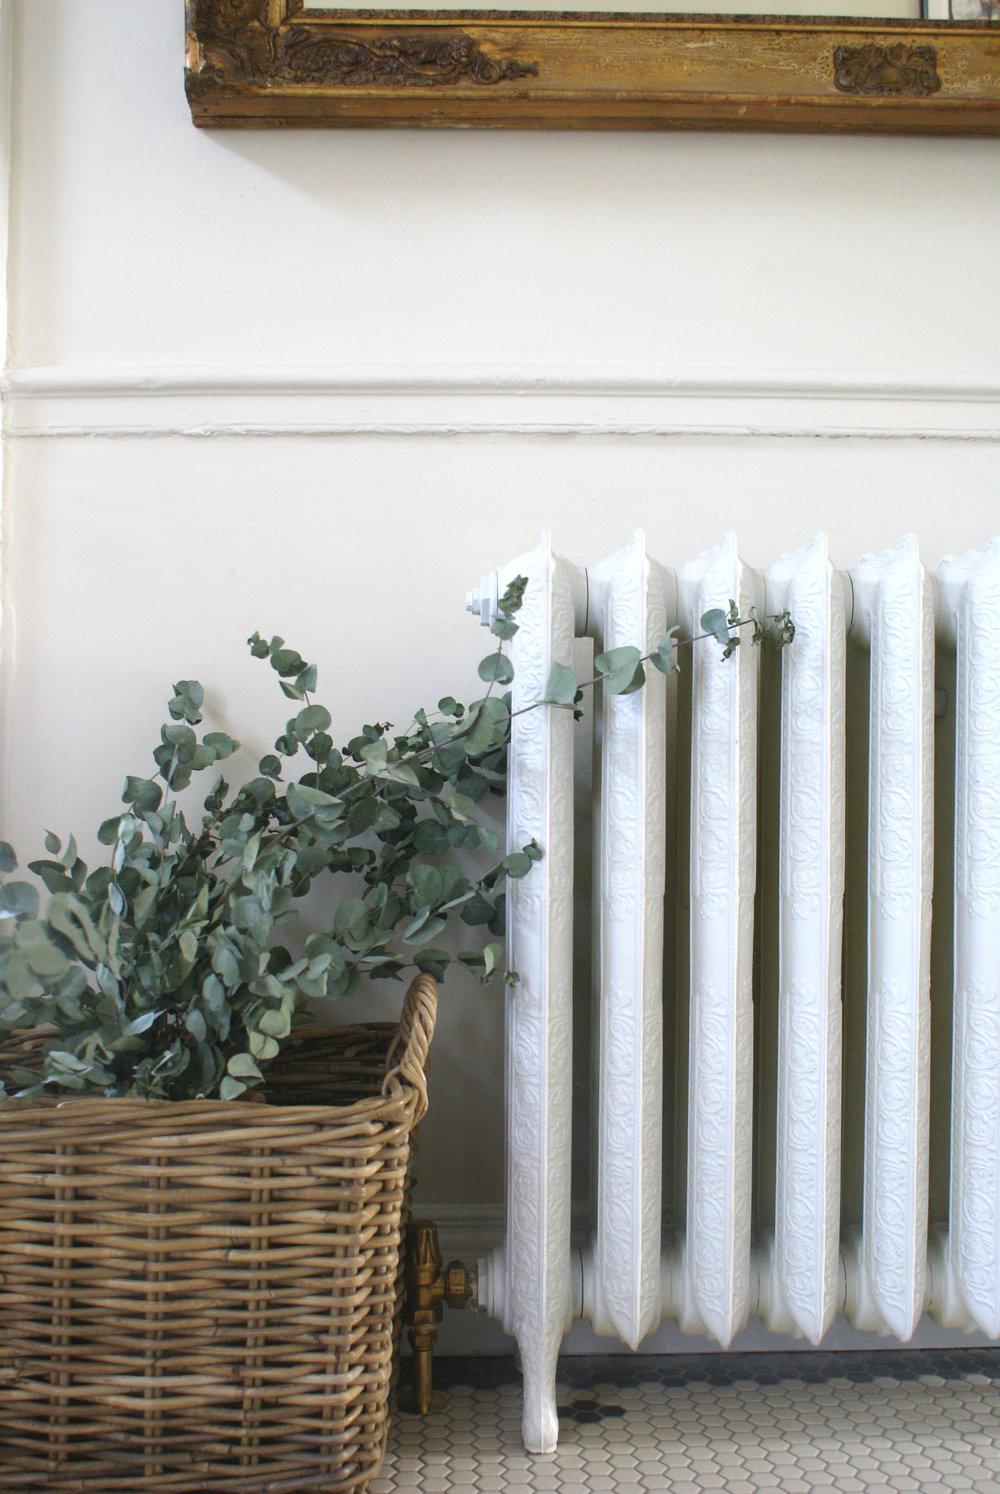 Cast iron radiator hallway with basket.jpg